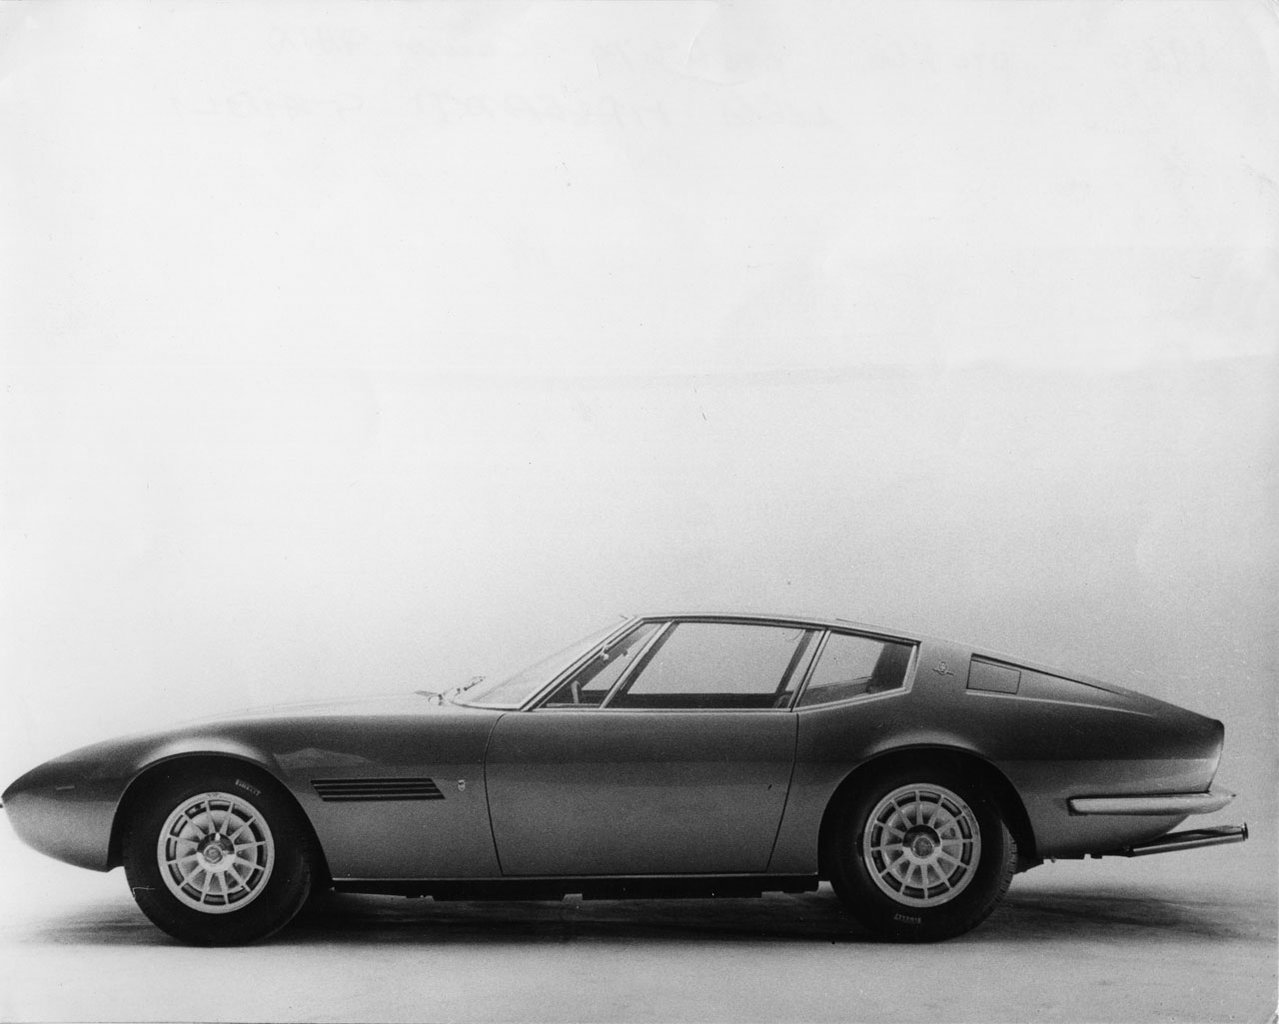 Maserati Ghibli 1967 1968 1969 1970 1971 1972 1973